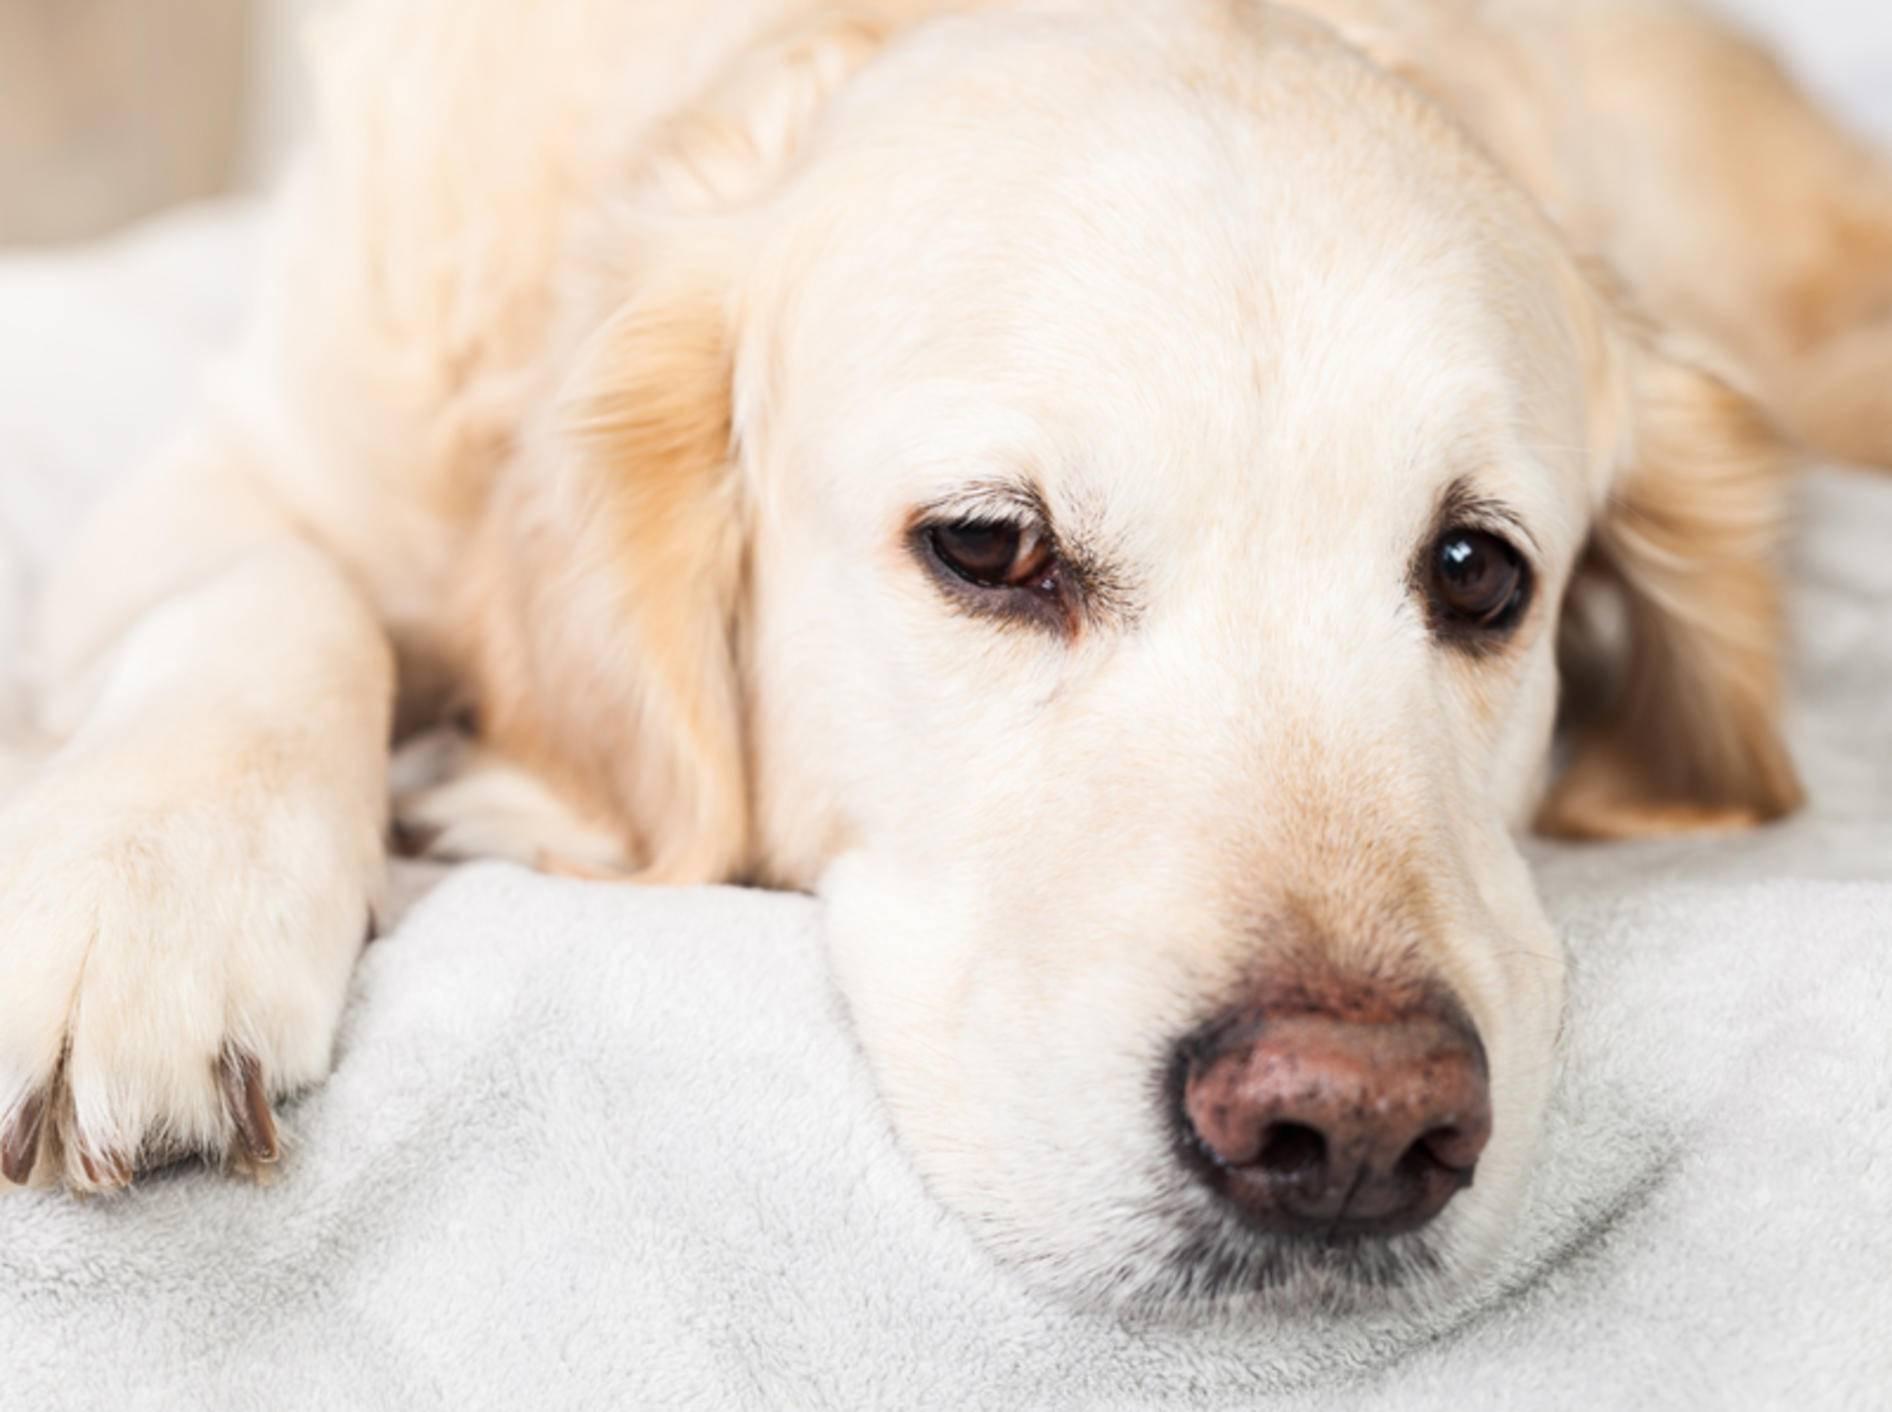 Das Vestibularsyndrom tritt häufig bei älteren Hunden auf - Bild: Shutterstock / Prystai